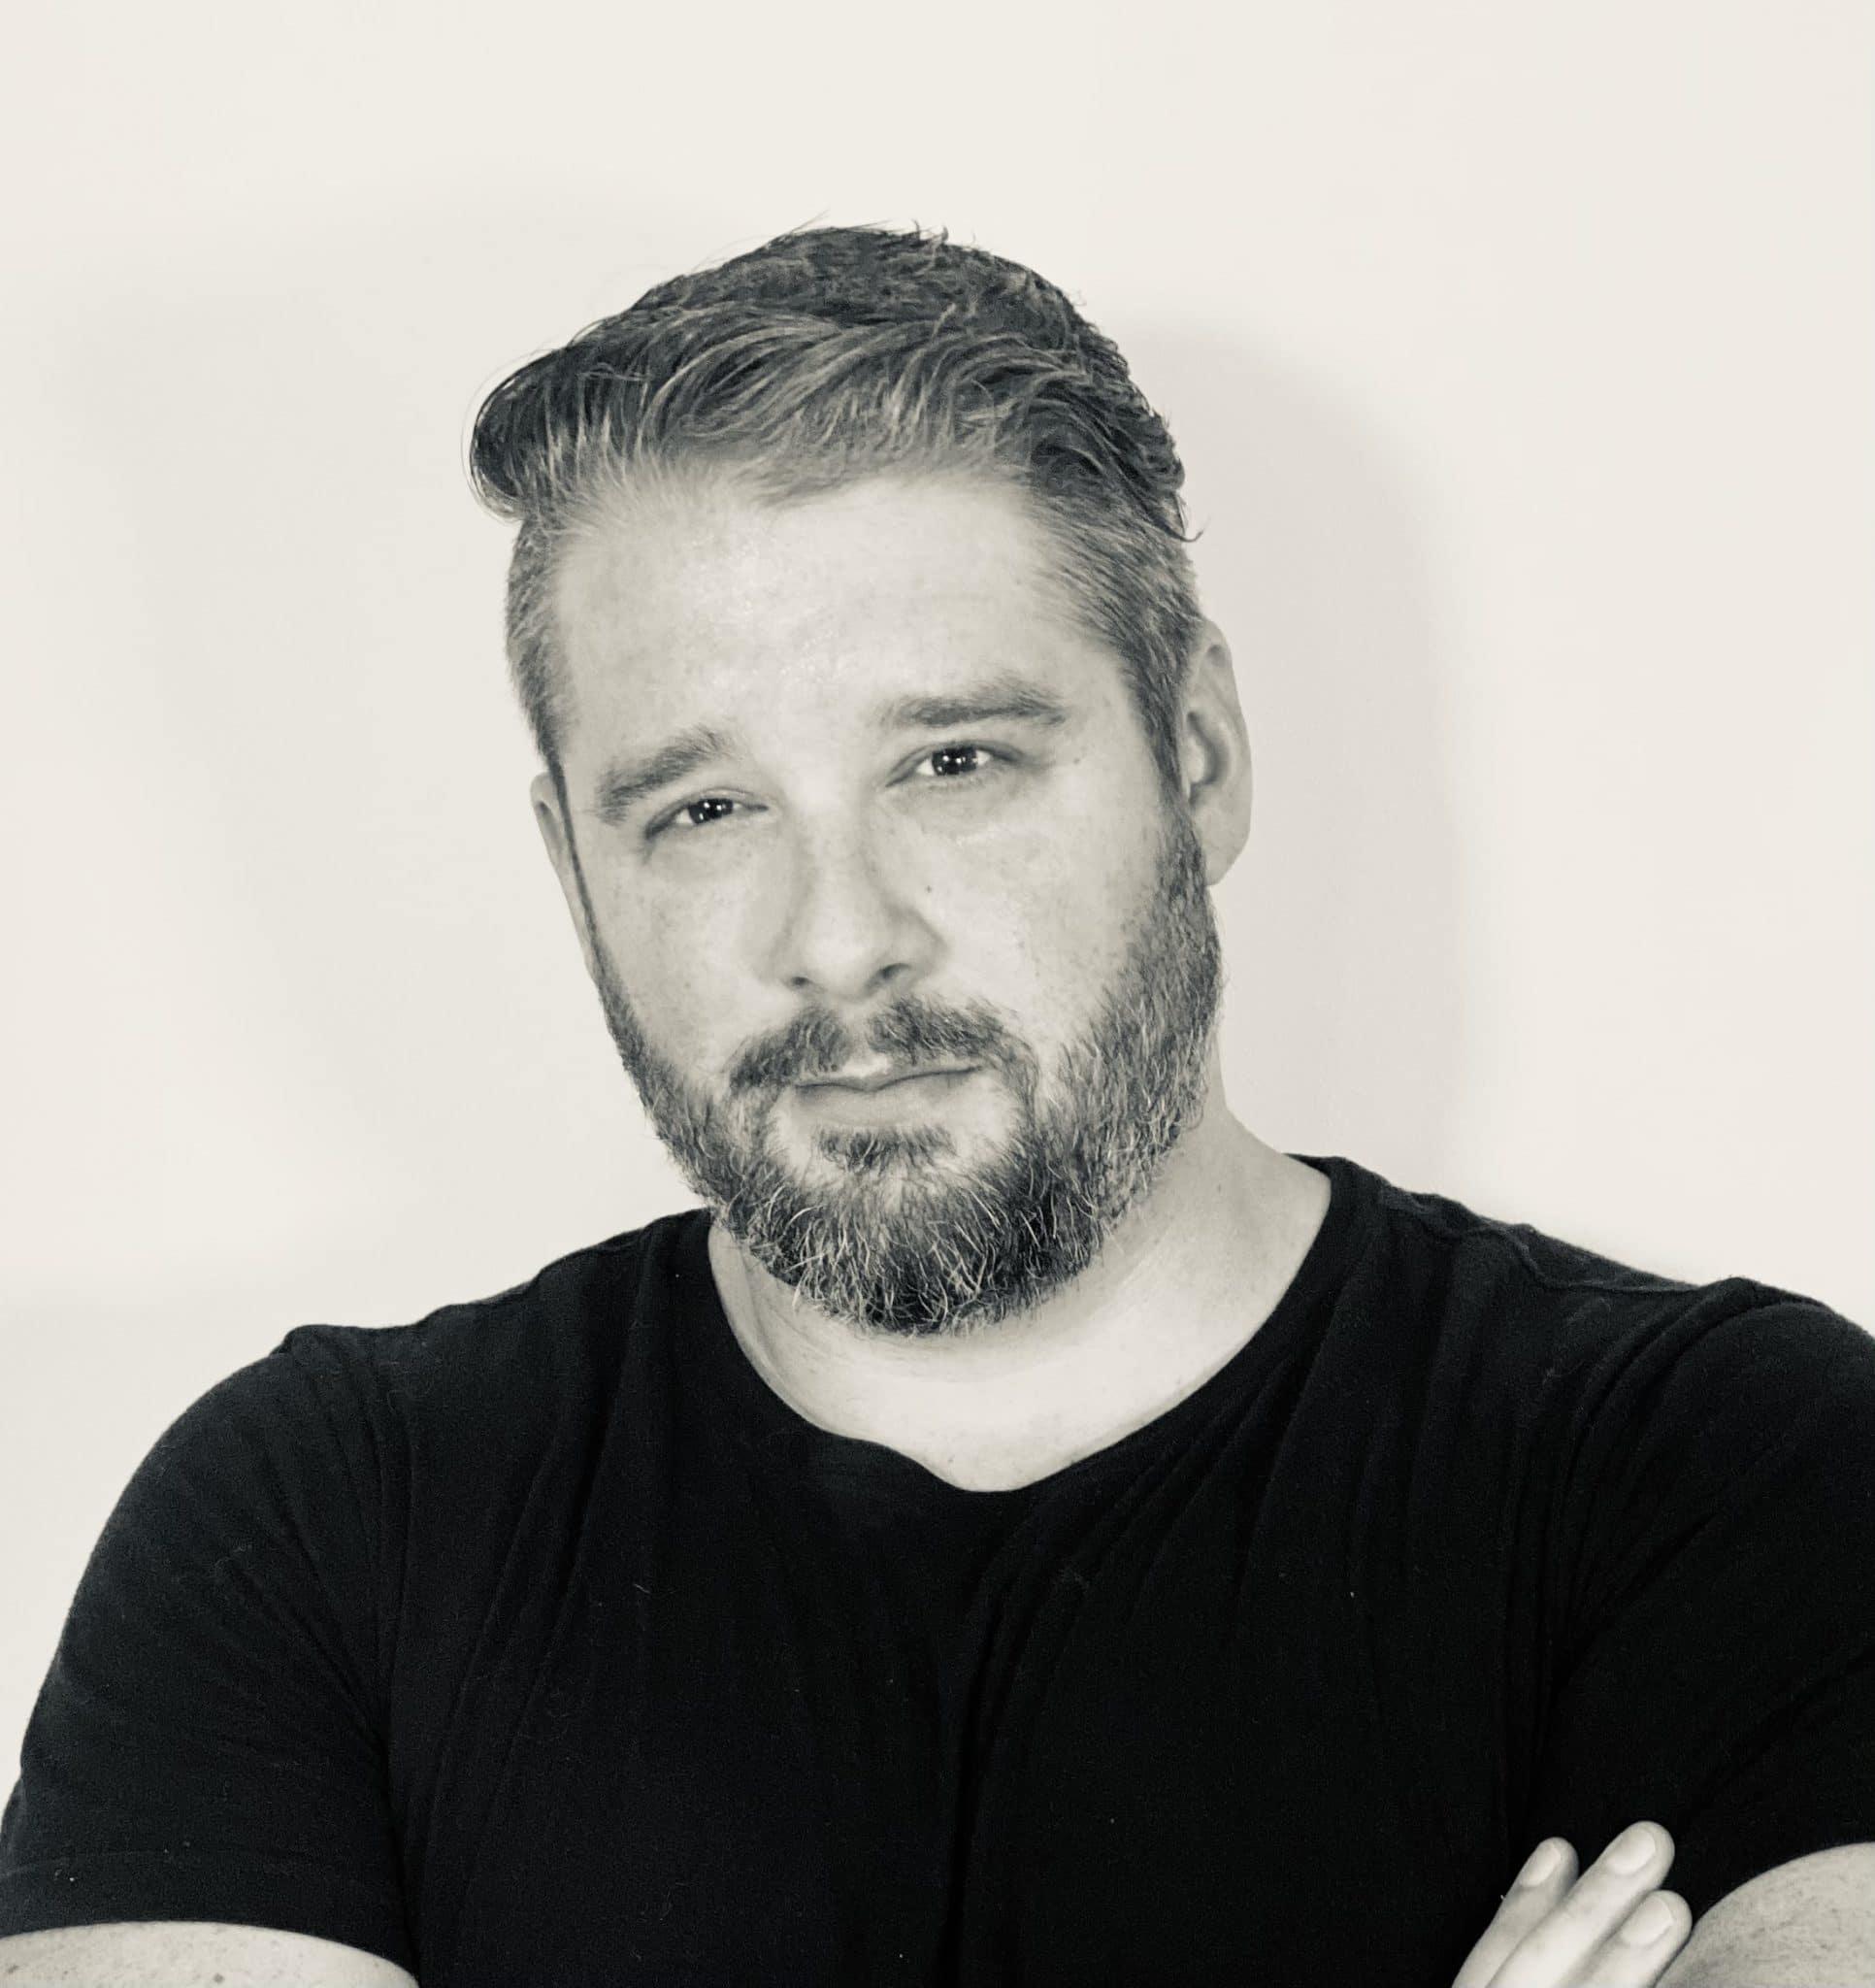 Andrew Lippincot MAK Digital Design